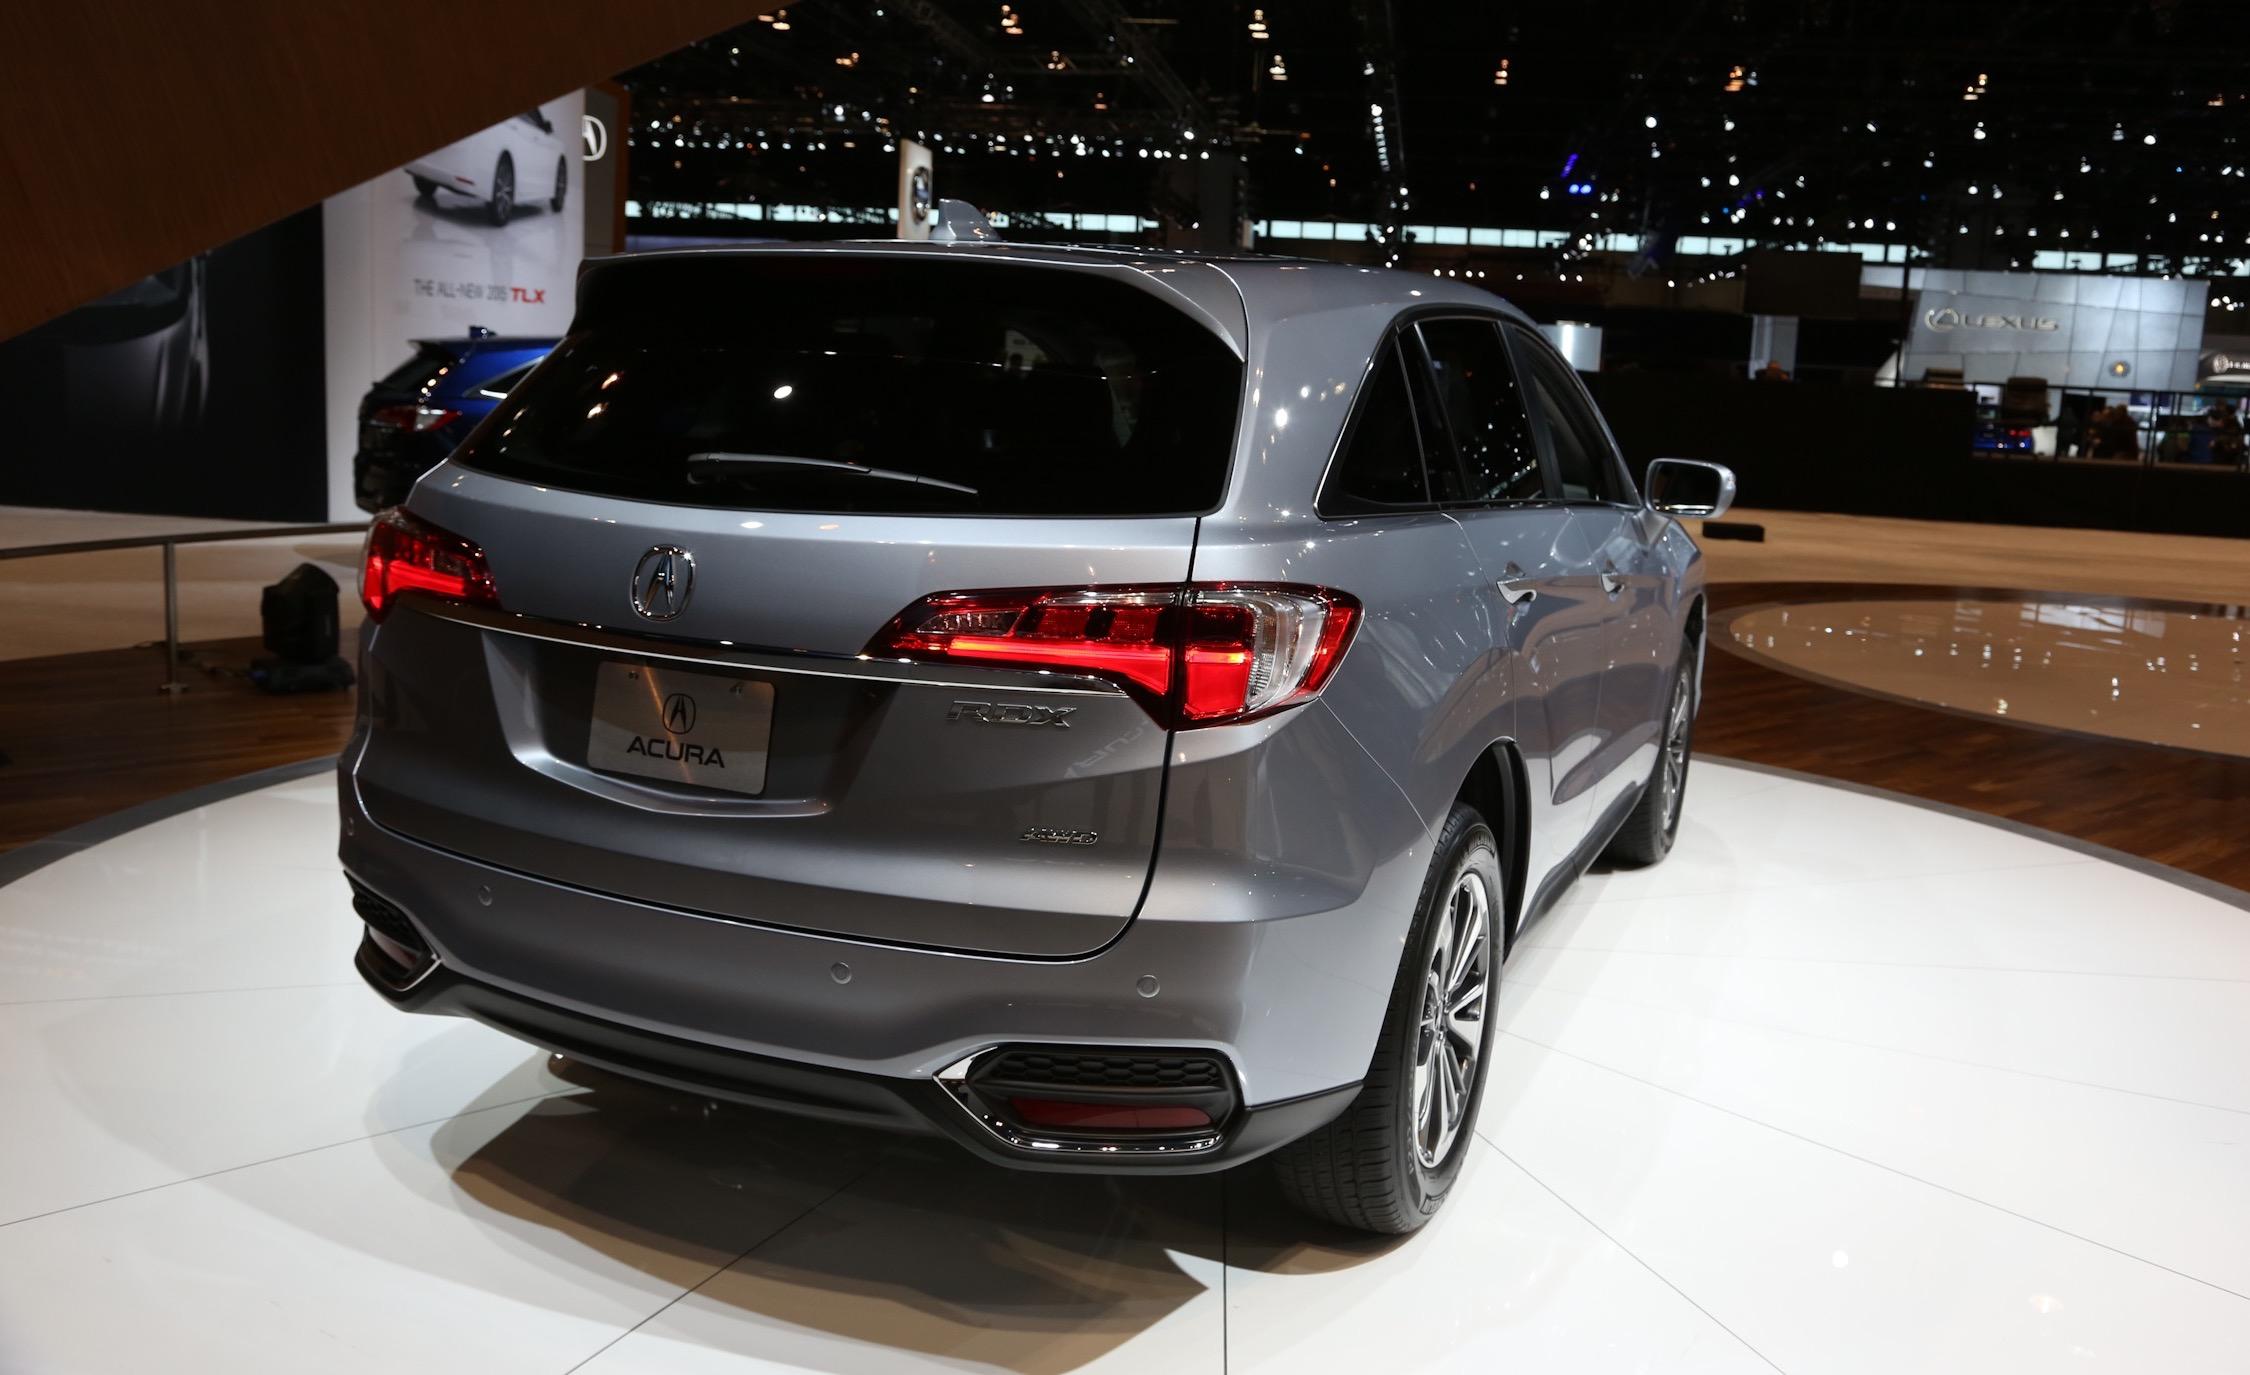 New 2016 Acura RDX Rear Side Design